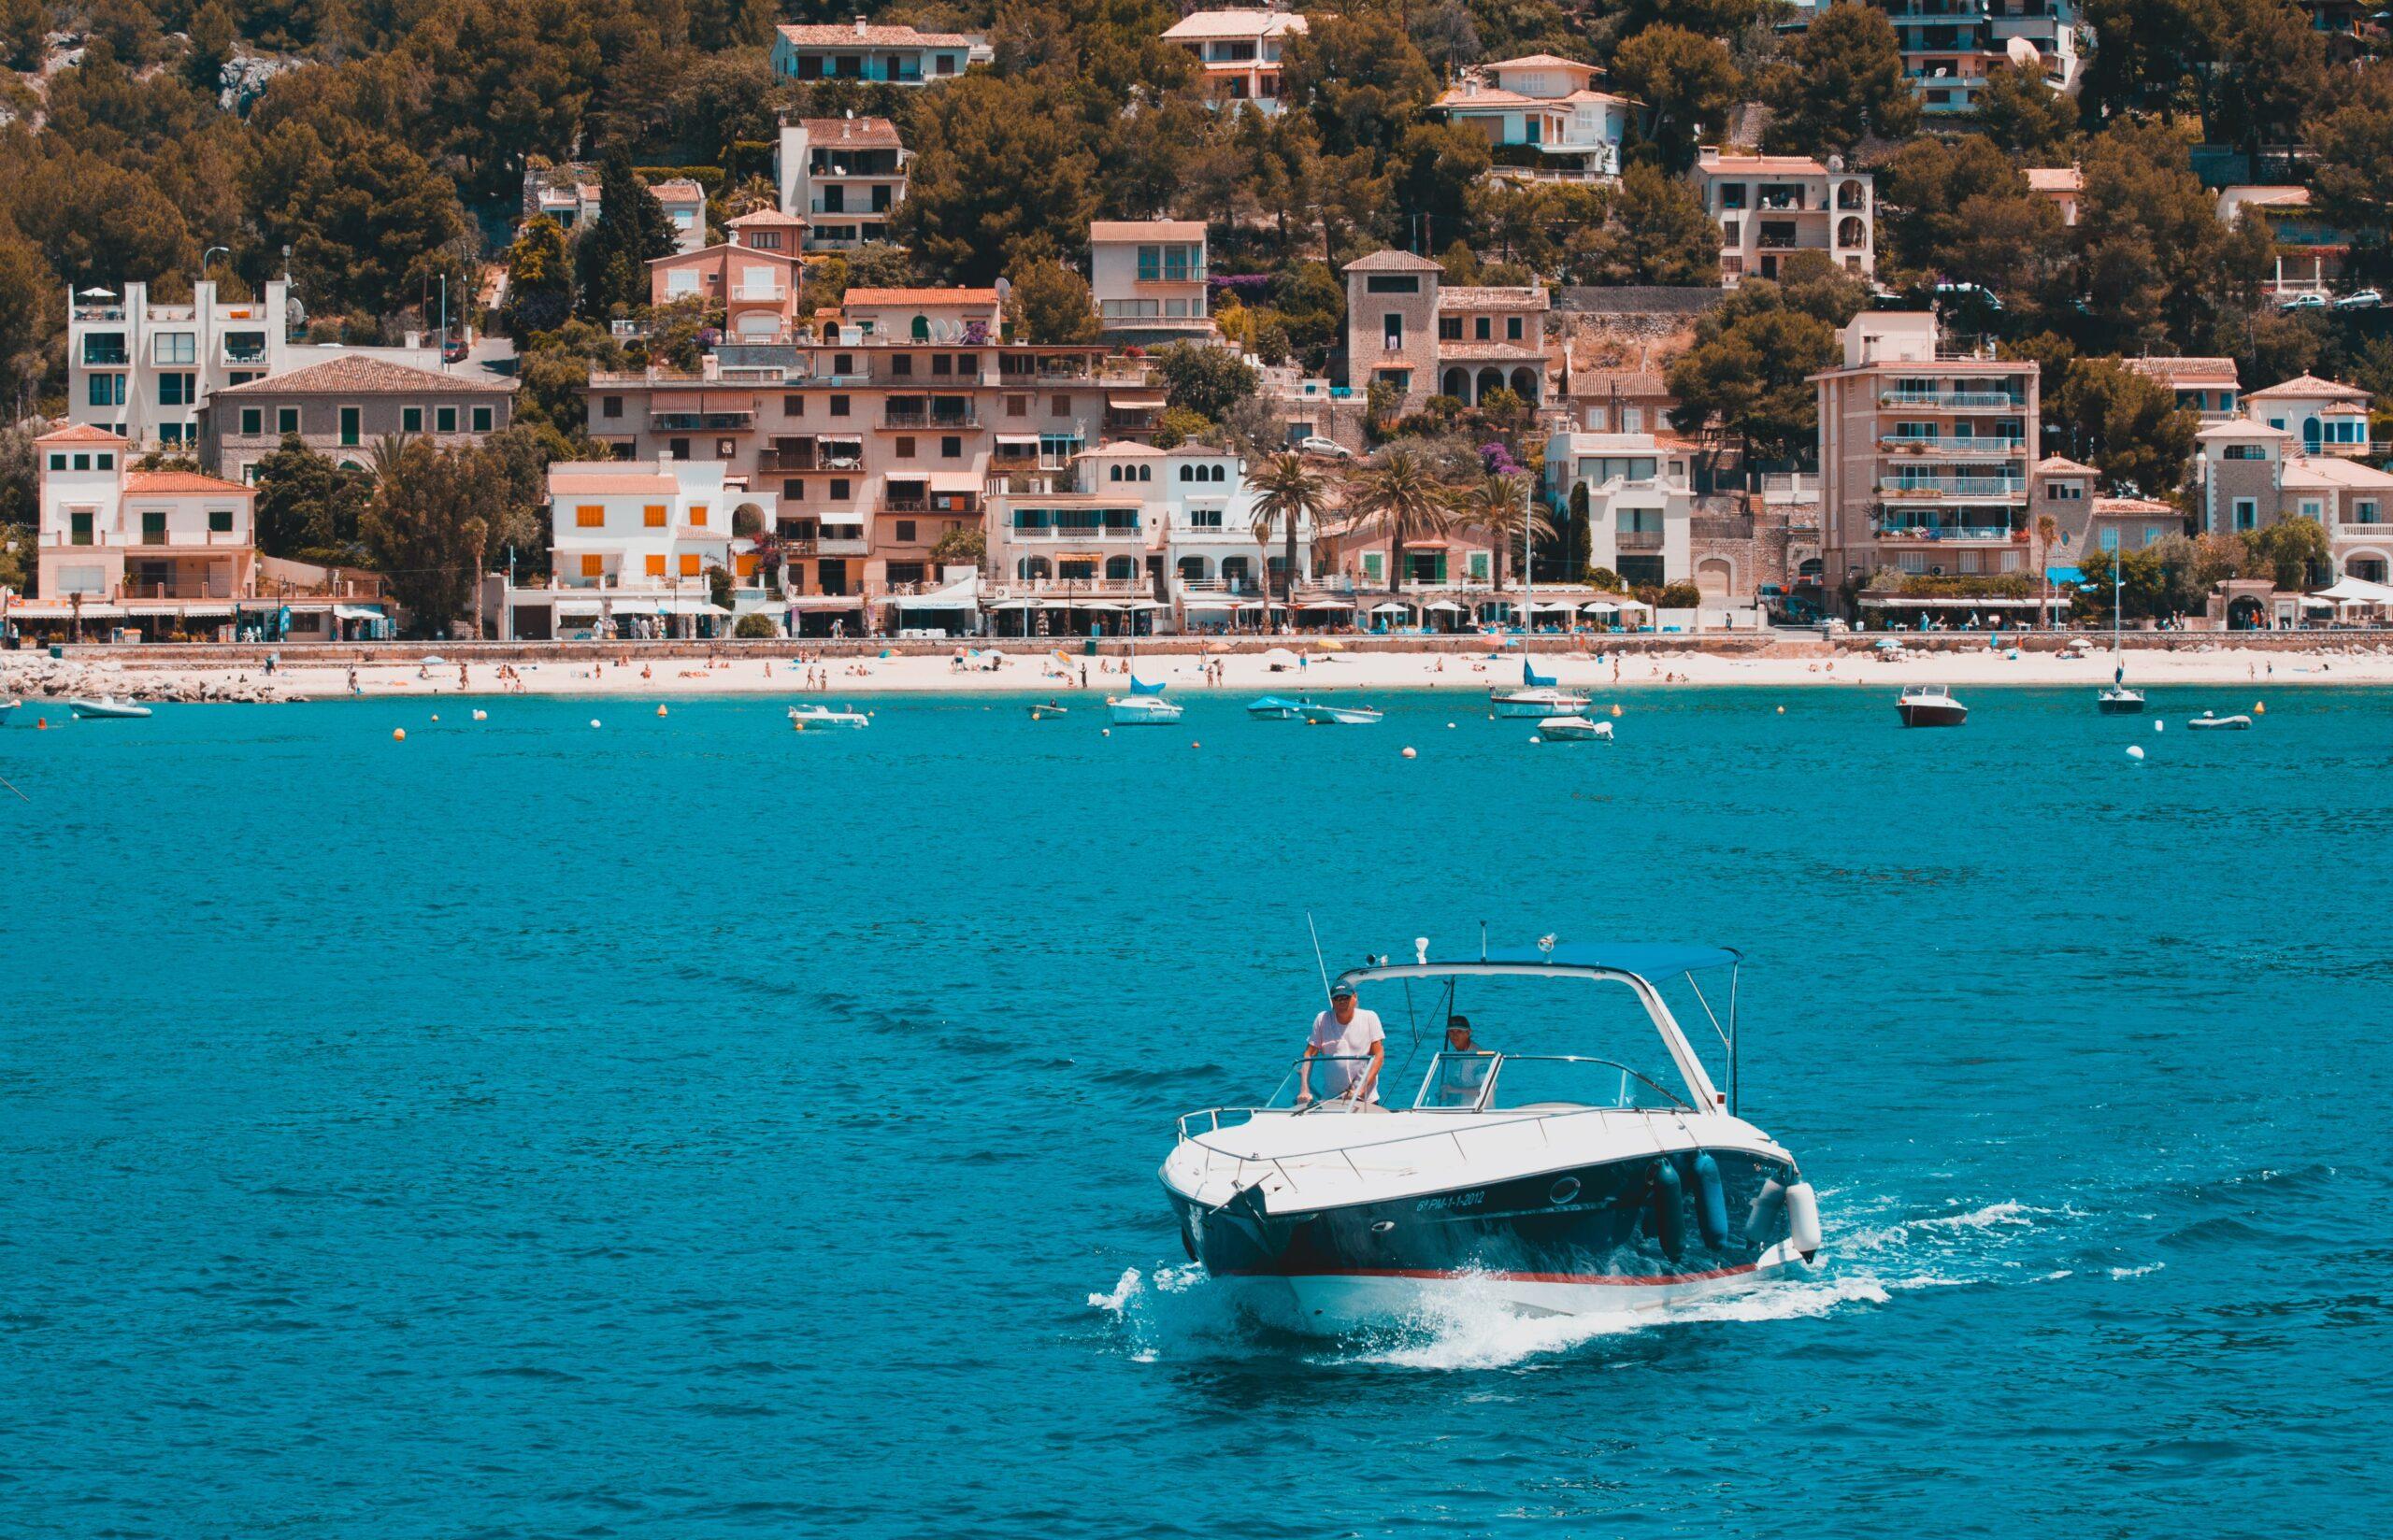 Cobertura de seguros para empresas náuticas: Responsabilidad Civil de la Empresa